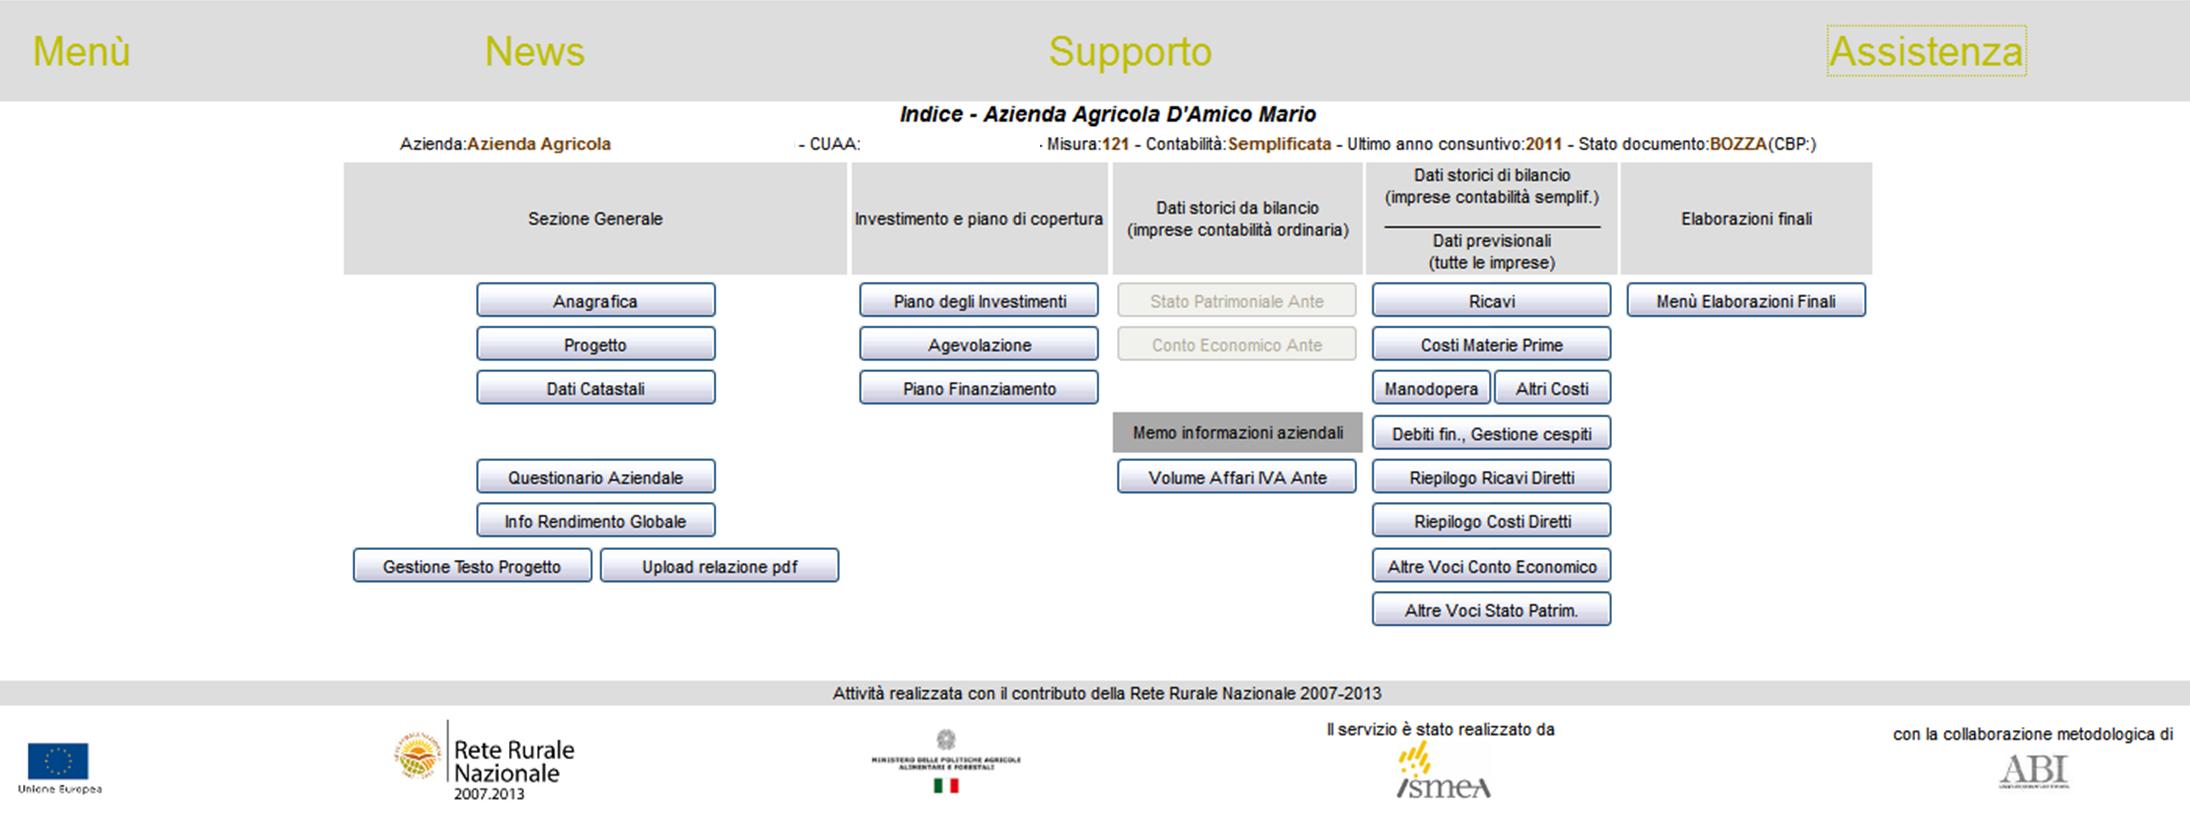 bpol business plan